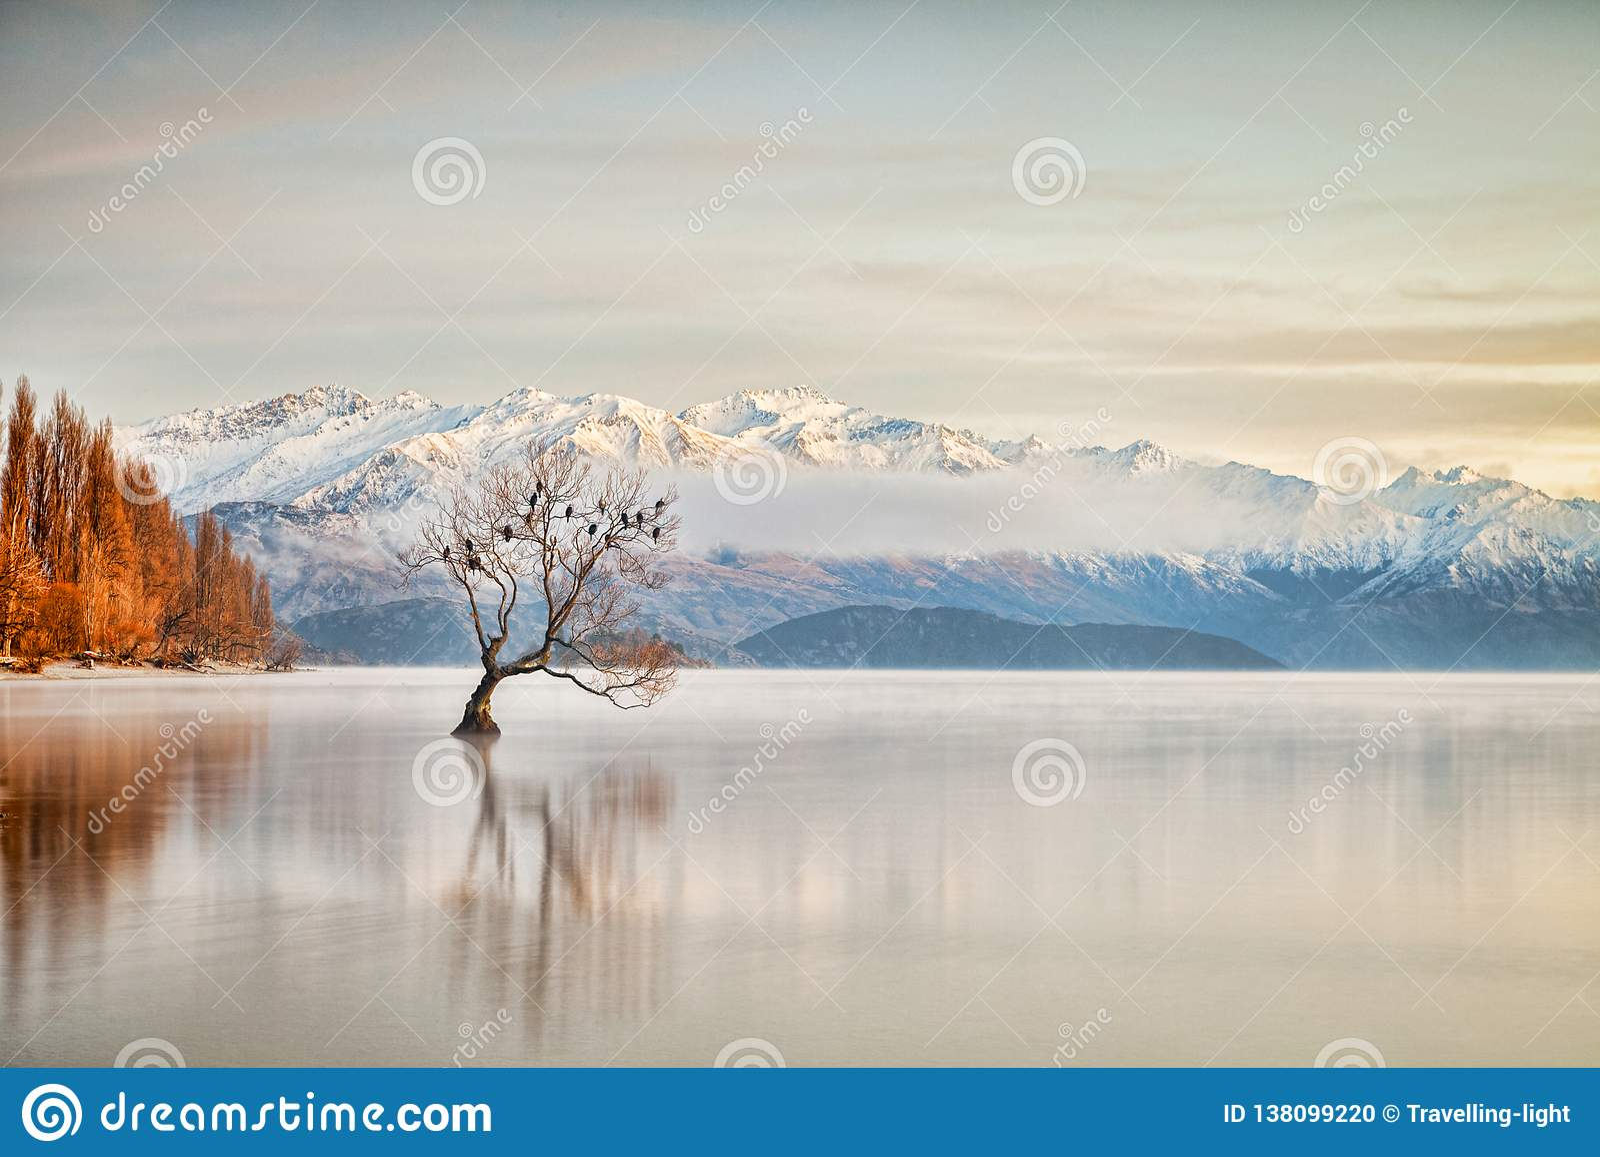 Lago Wanaka Otago Nuova Zelanda